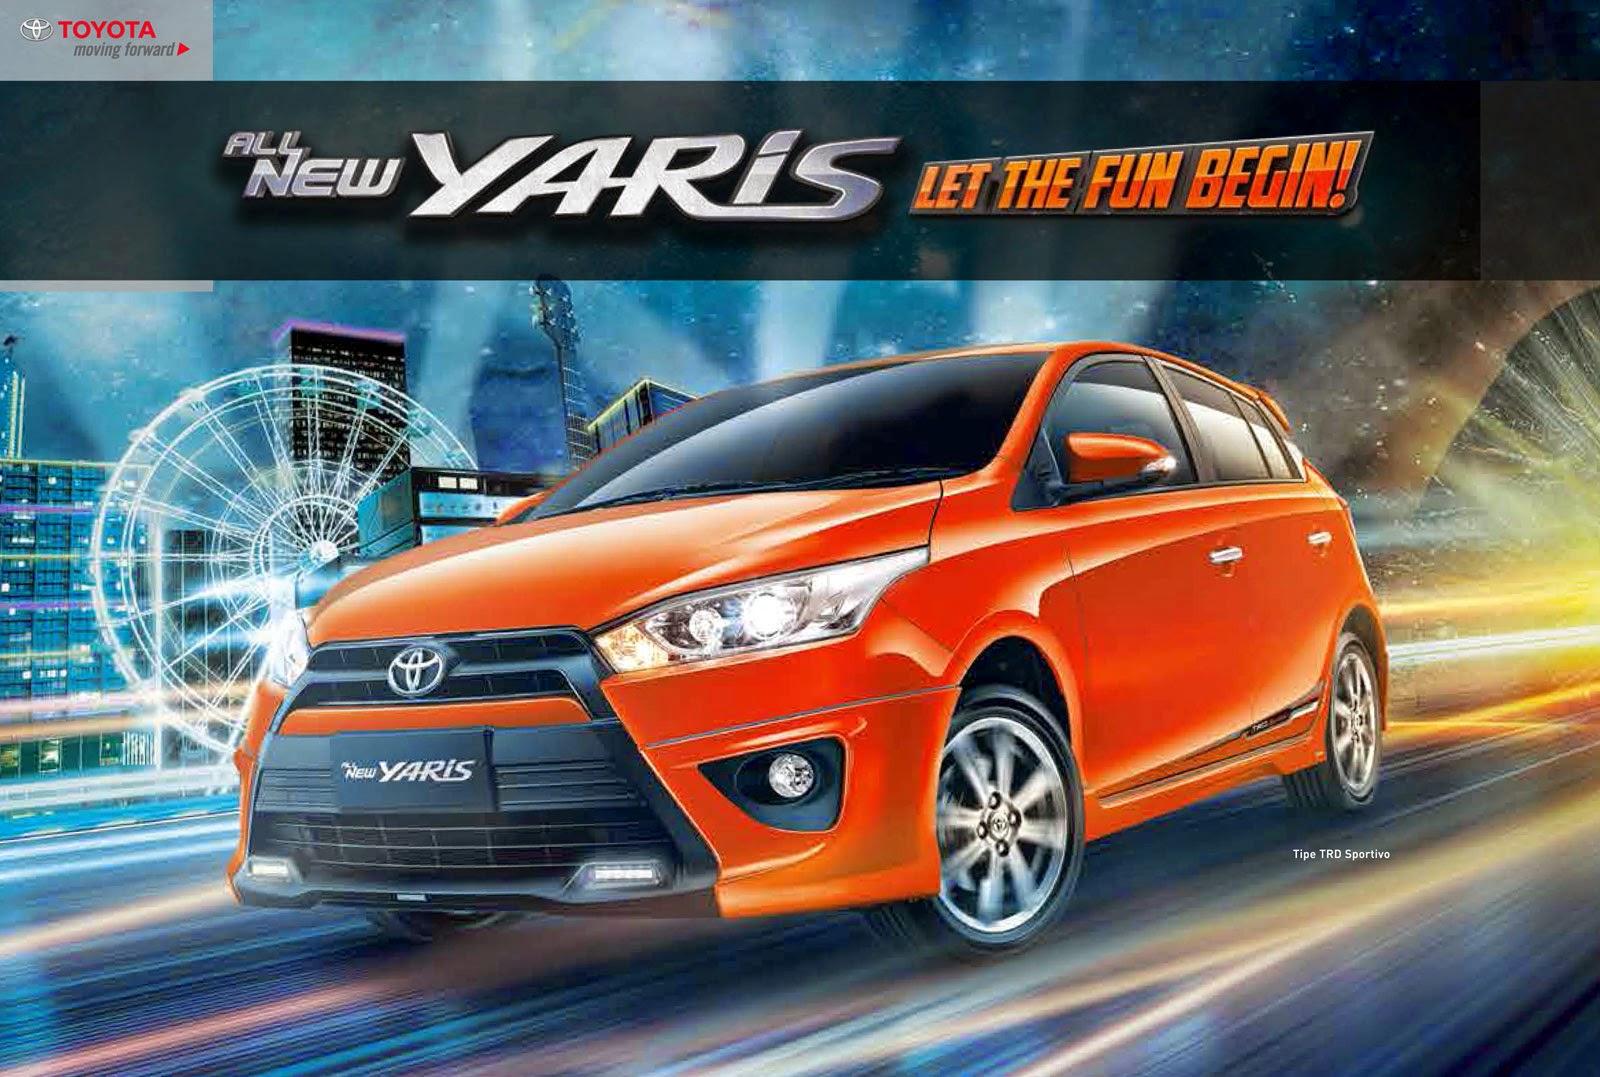 Toyota All New Yaris TRD Sportivo